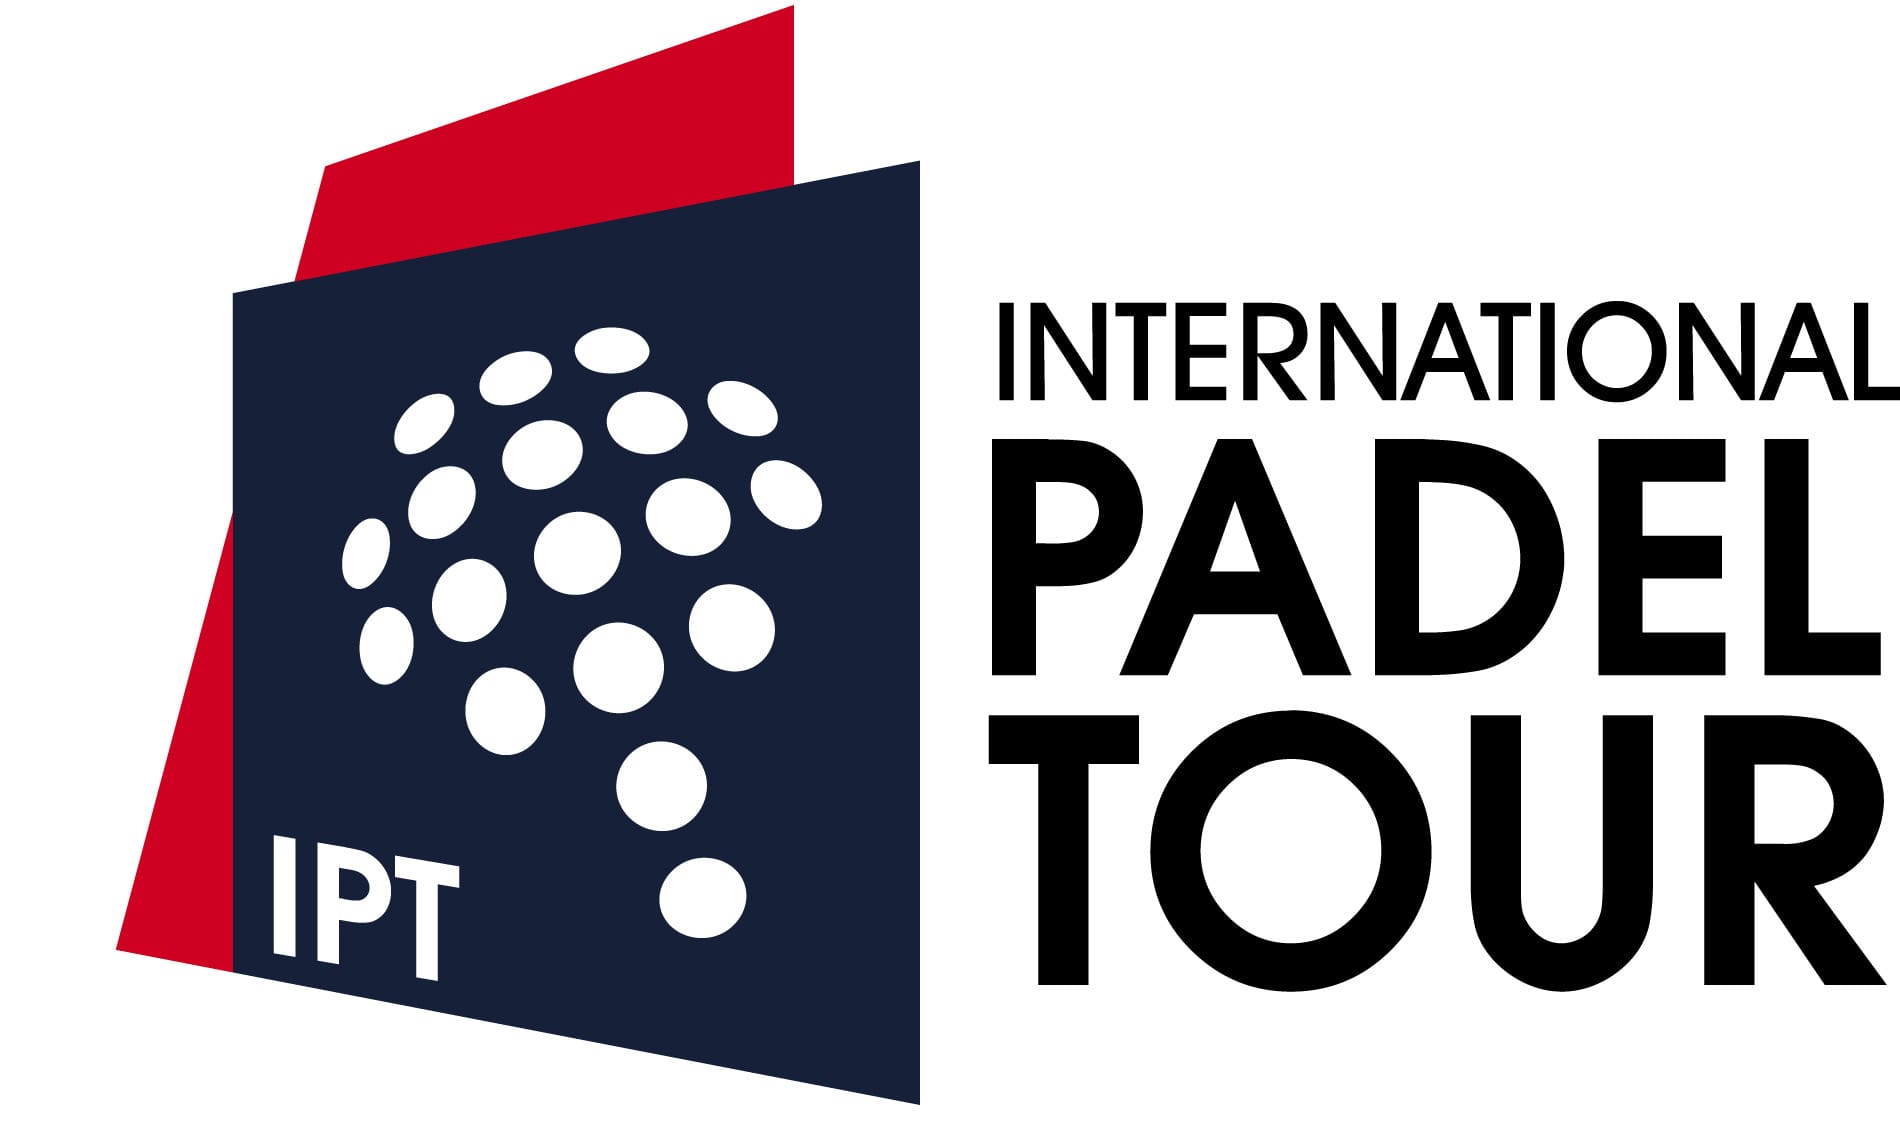 IPT Internacional Pádel Tour: se presenta oficialmente la competencia para World Padel Tour